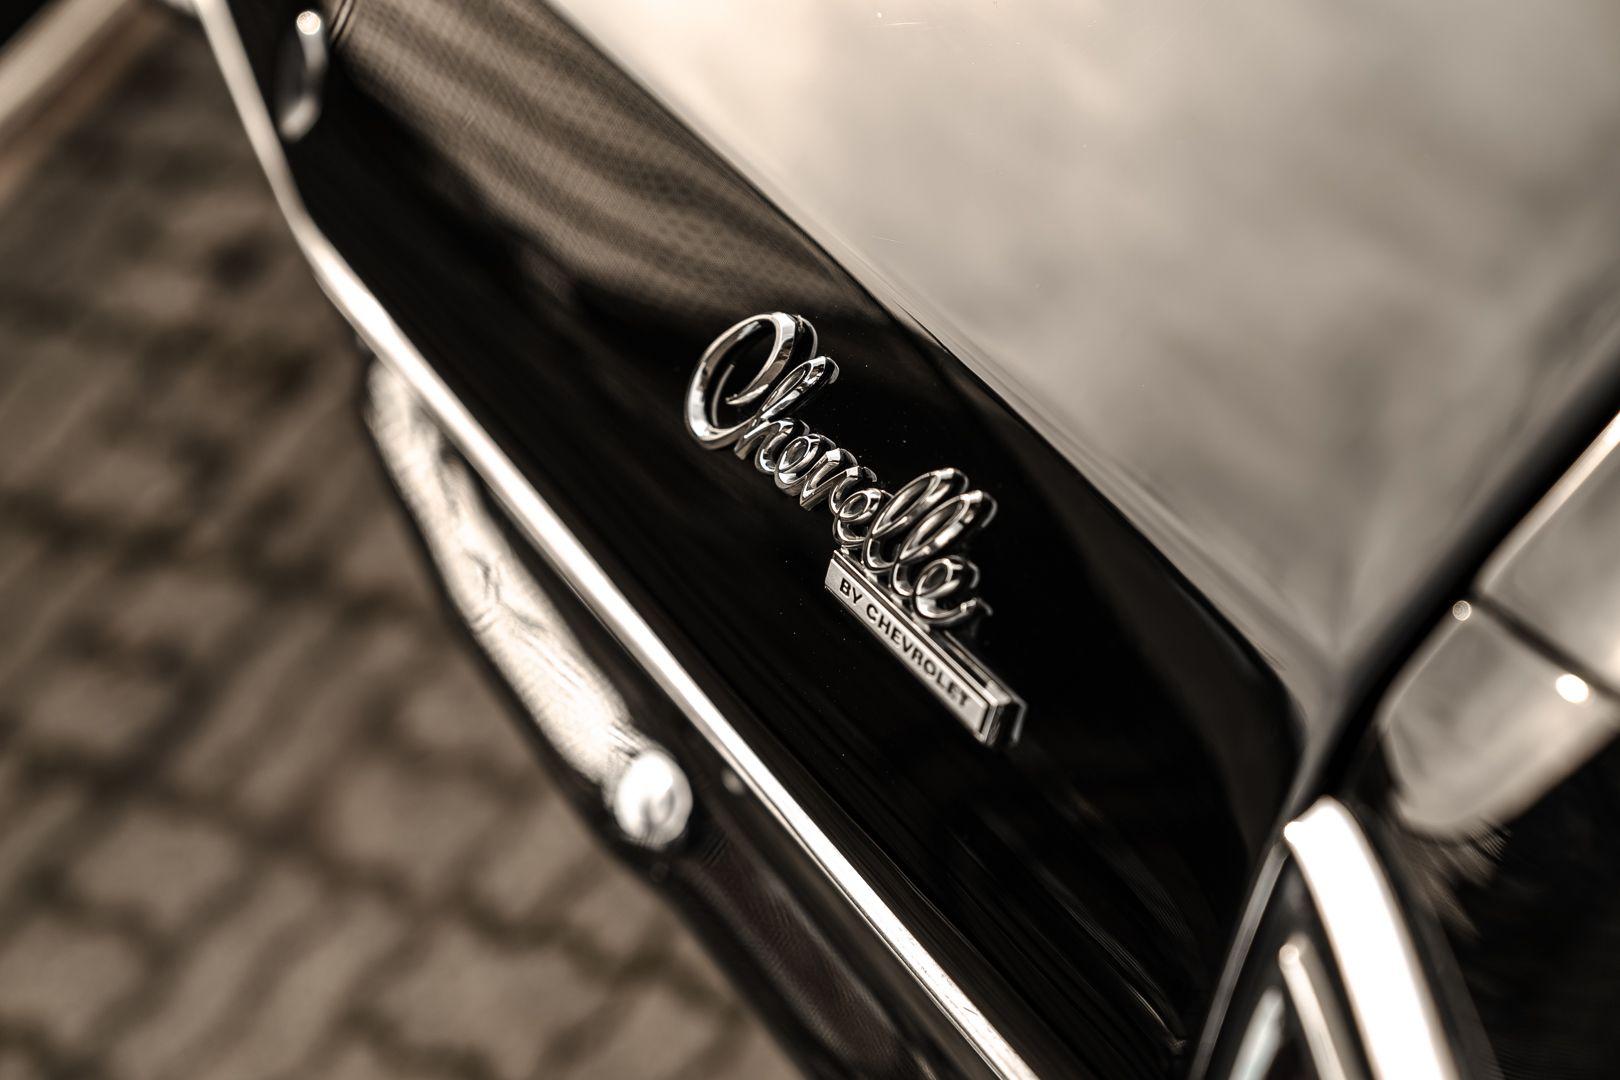 1969 Chevrolet Chevelle SS 62980